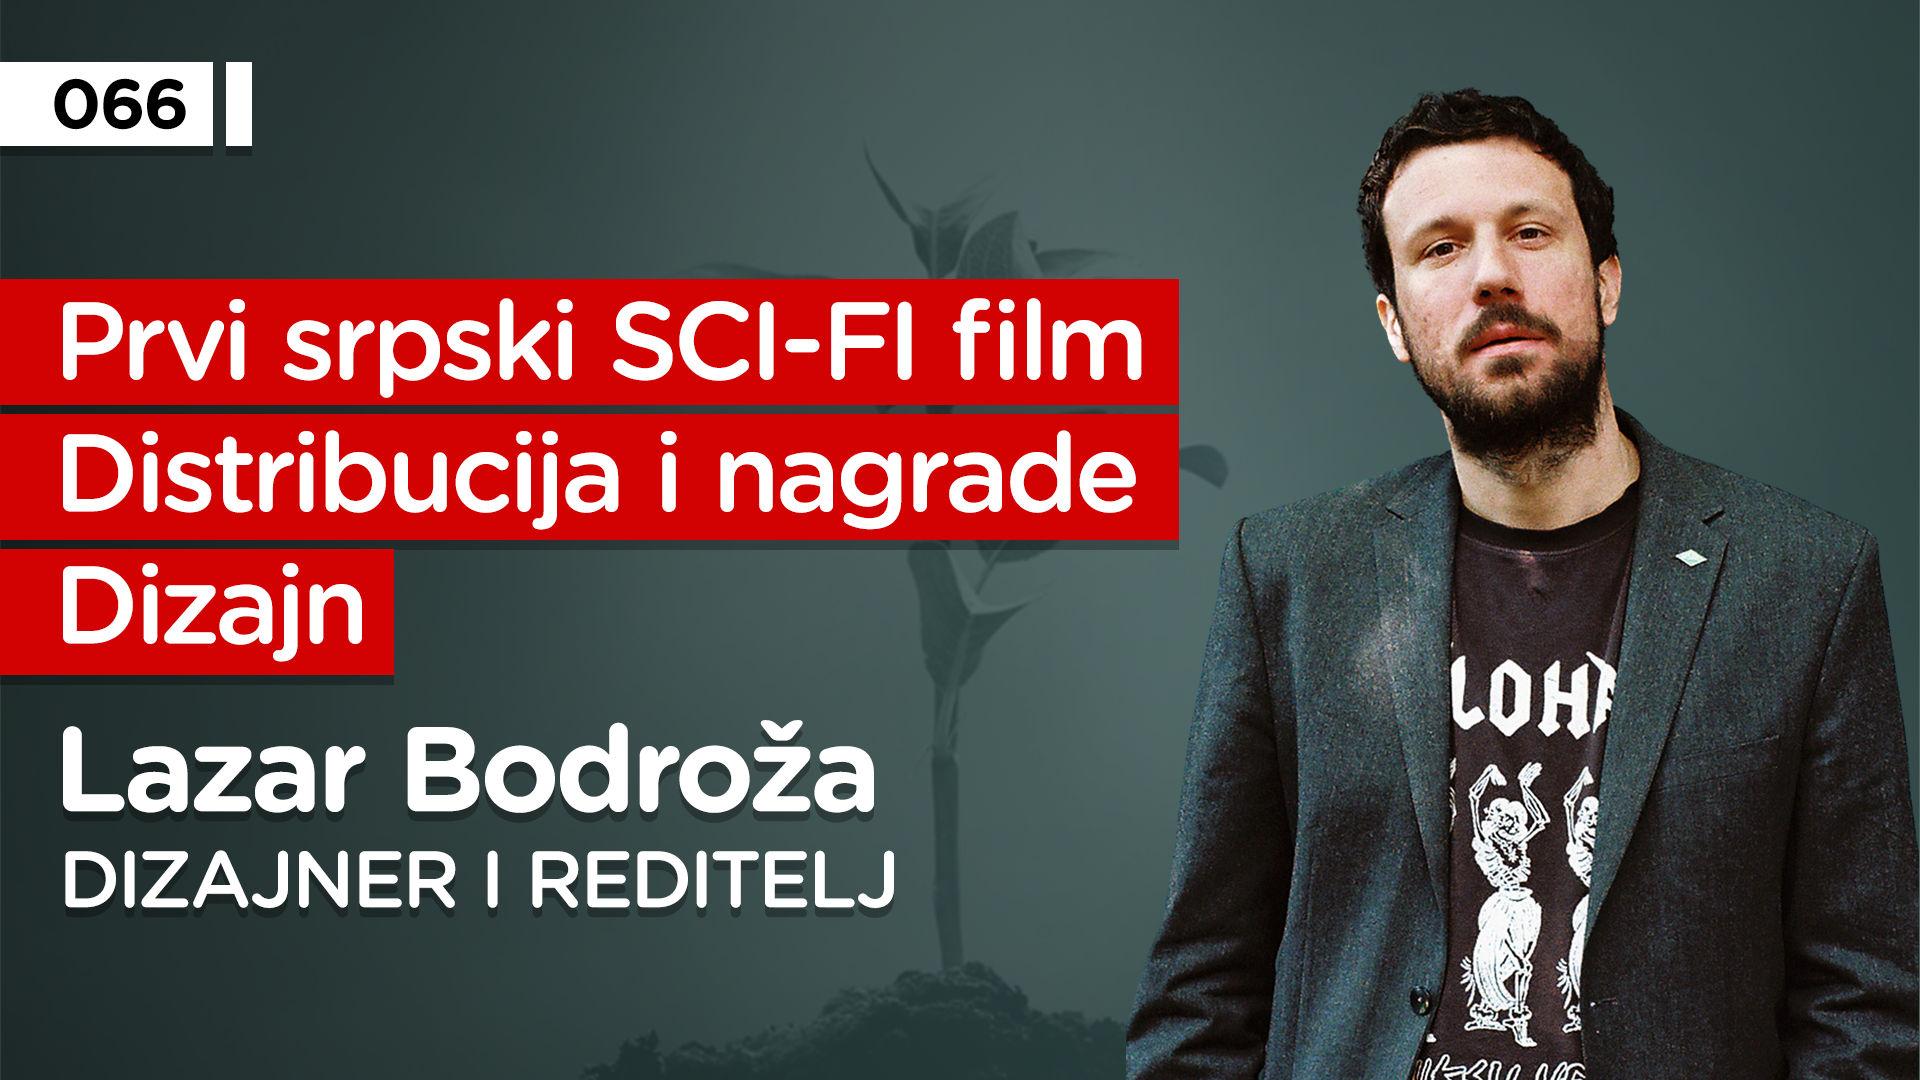 EP066: Lazar Bodroža